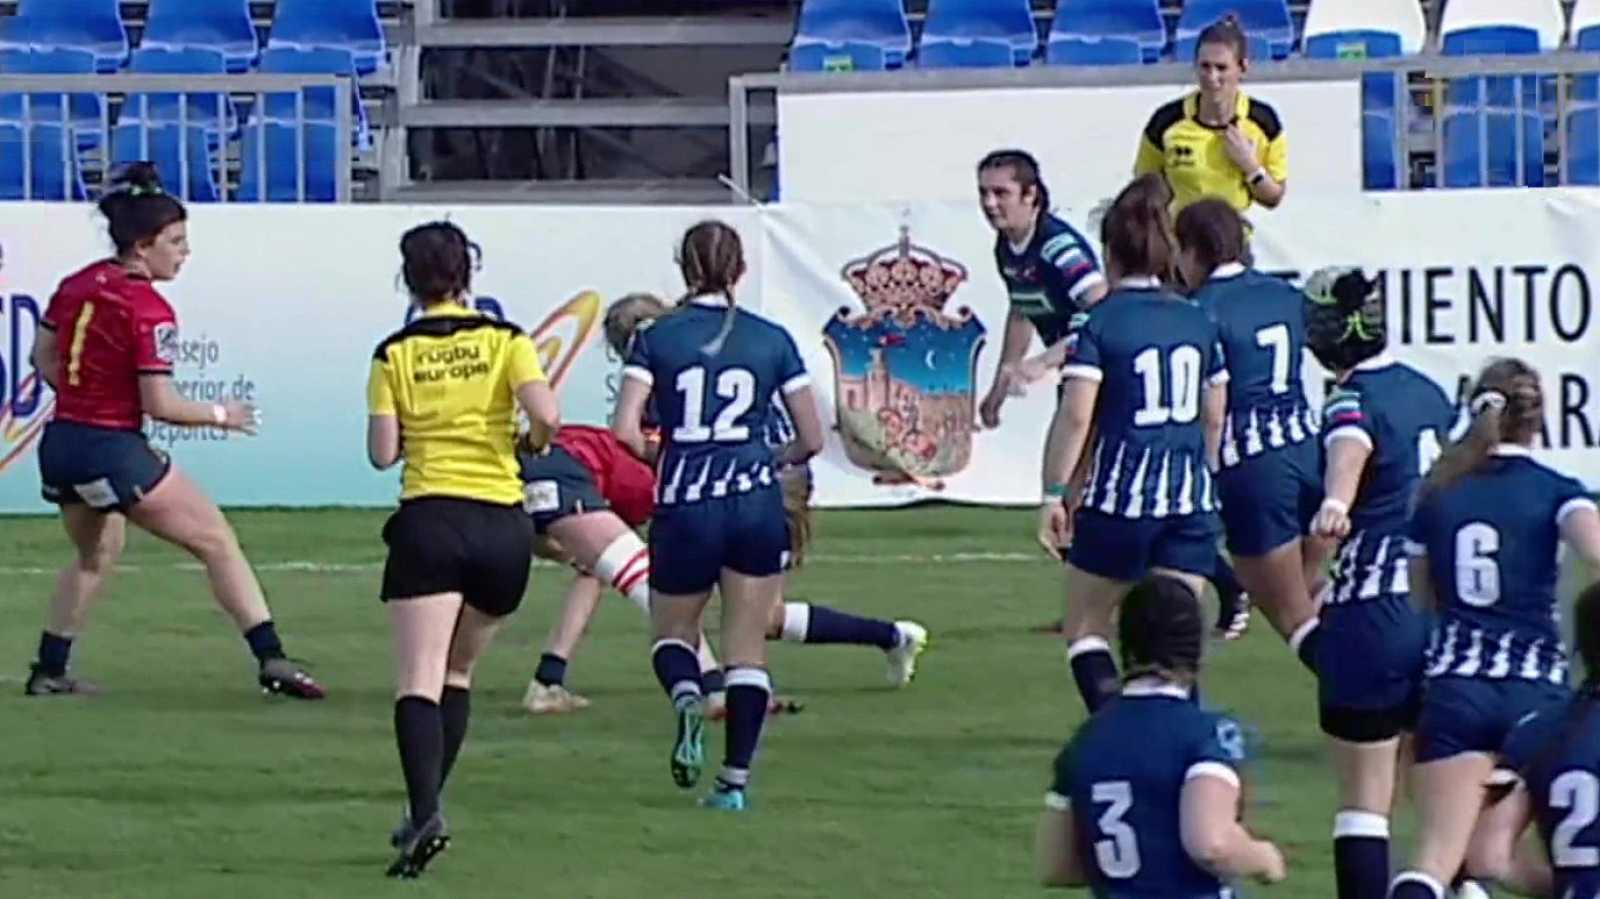 Rugby - Campeonato de Europa Femenino: España - Rusia - ver ahora